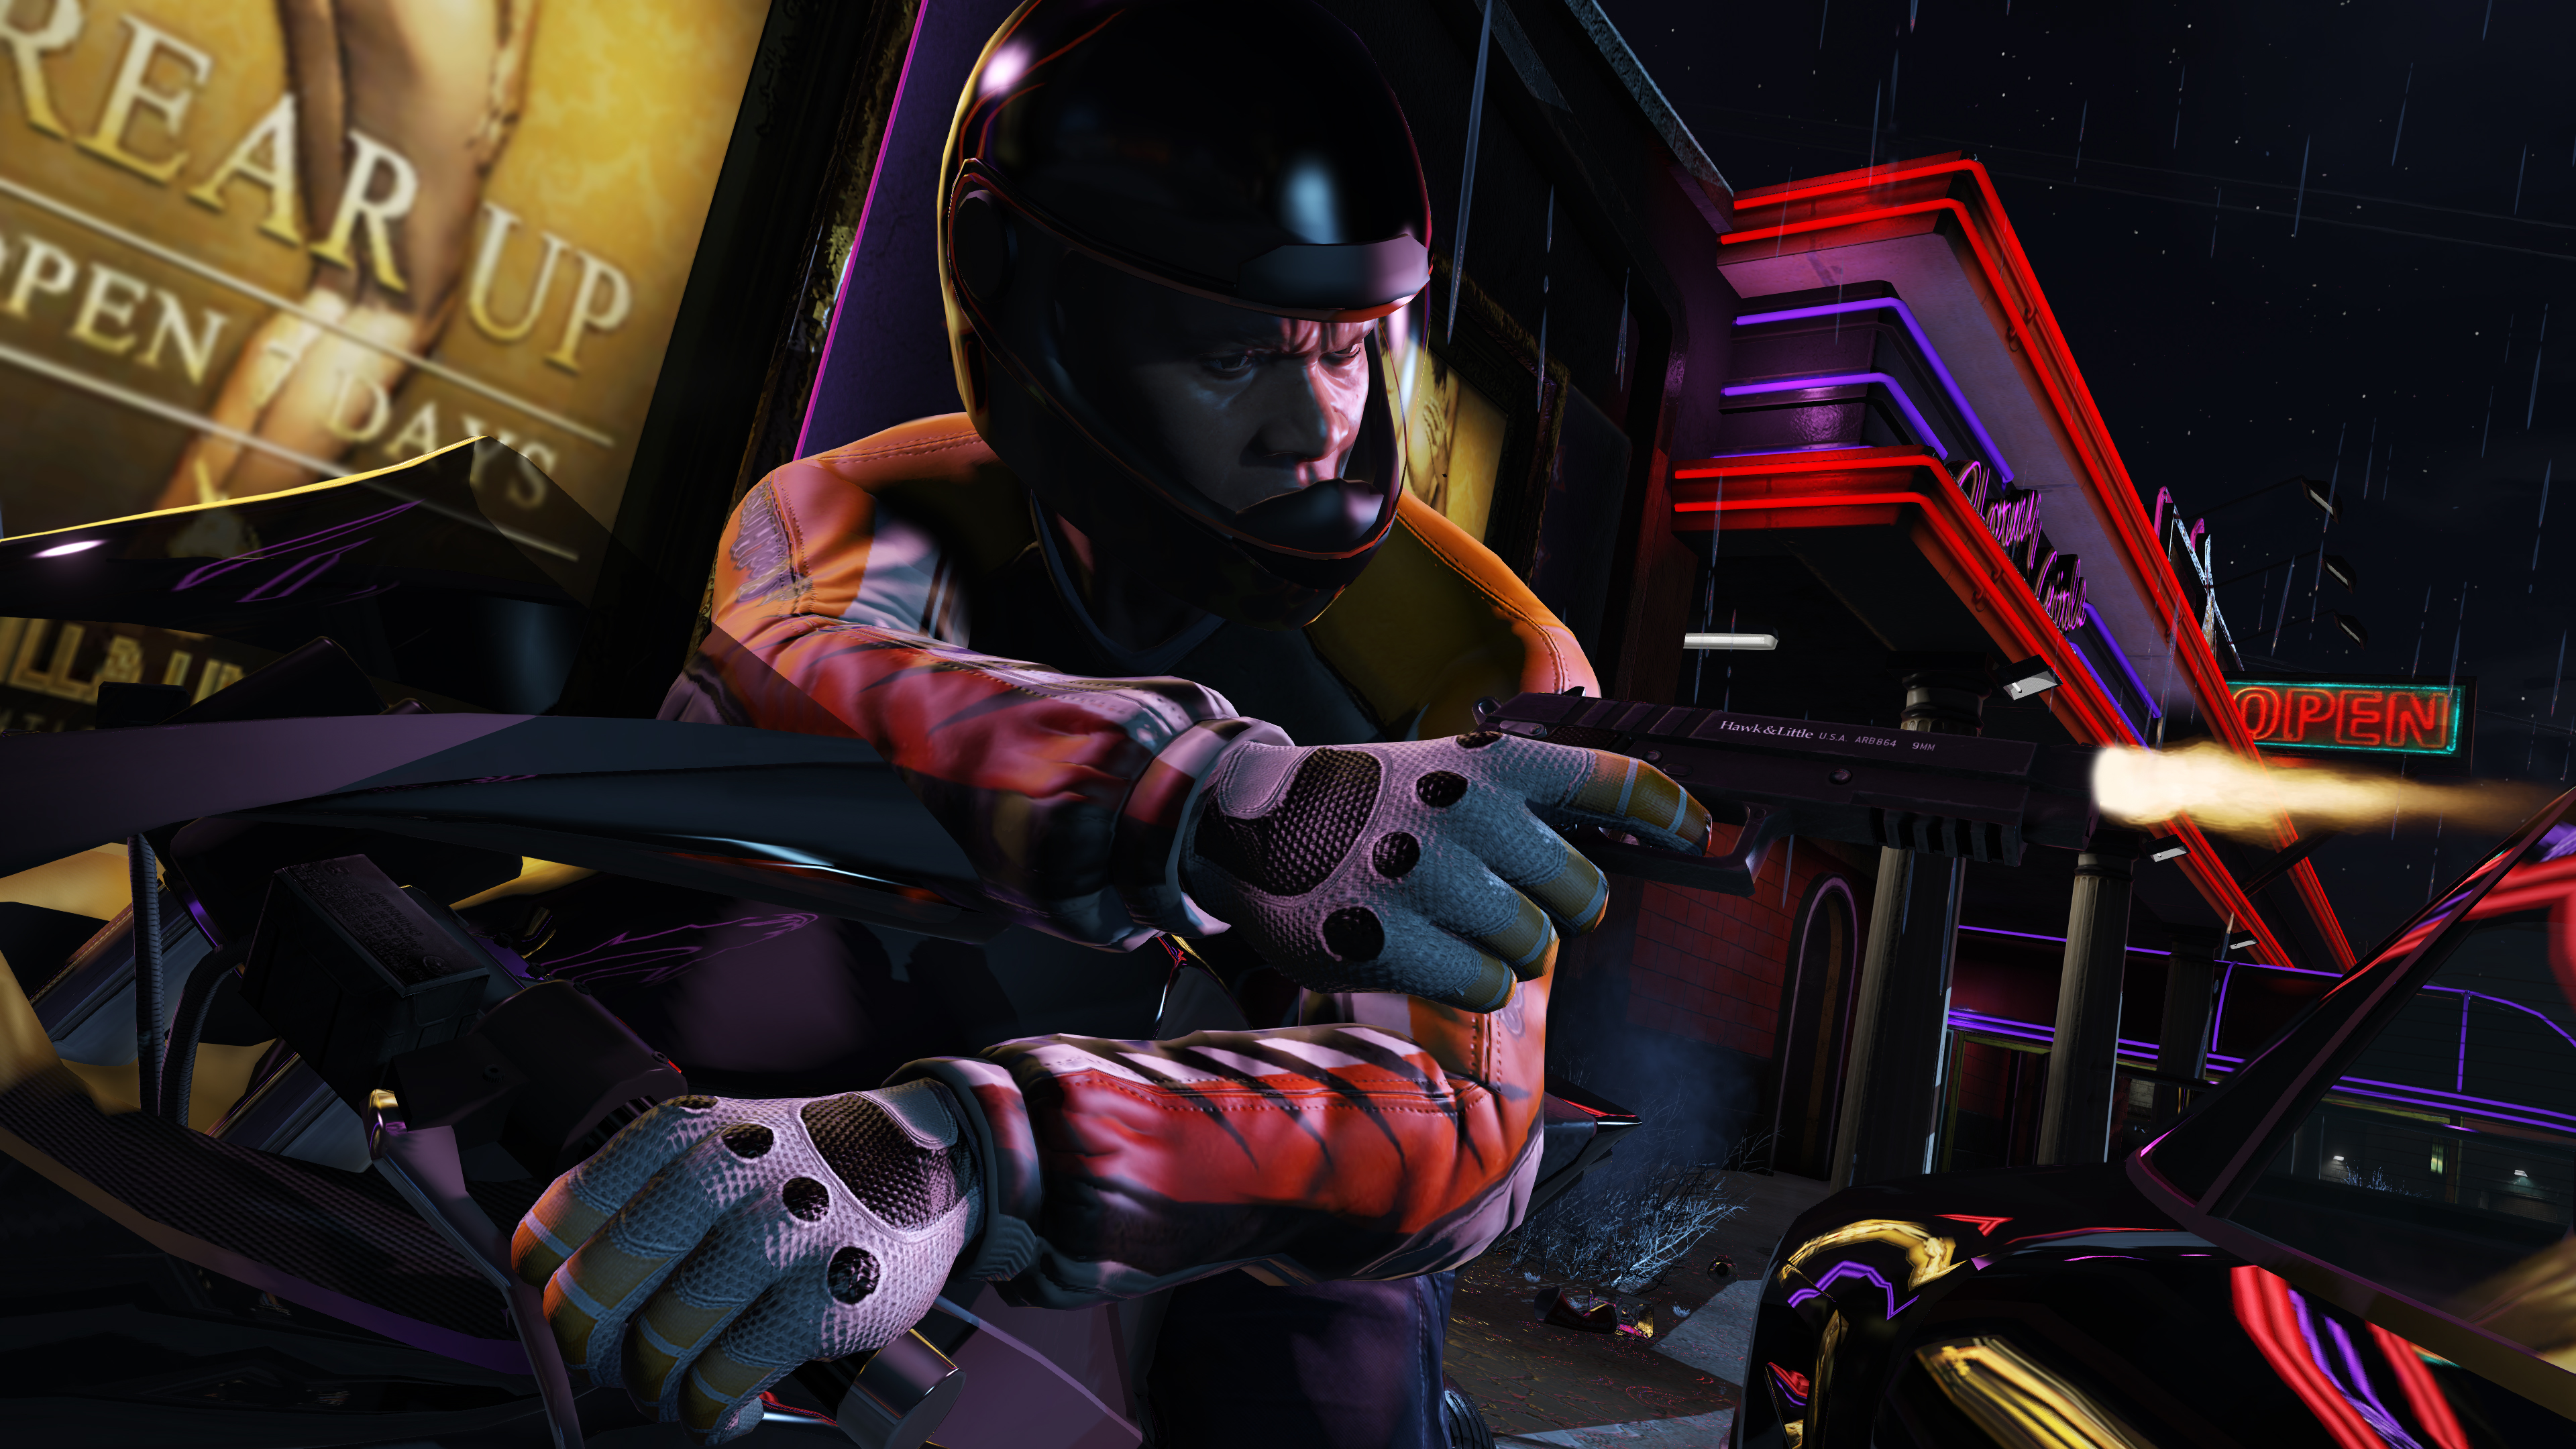 New Grand Theft Auto V PC Screens - Rockstar Games